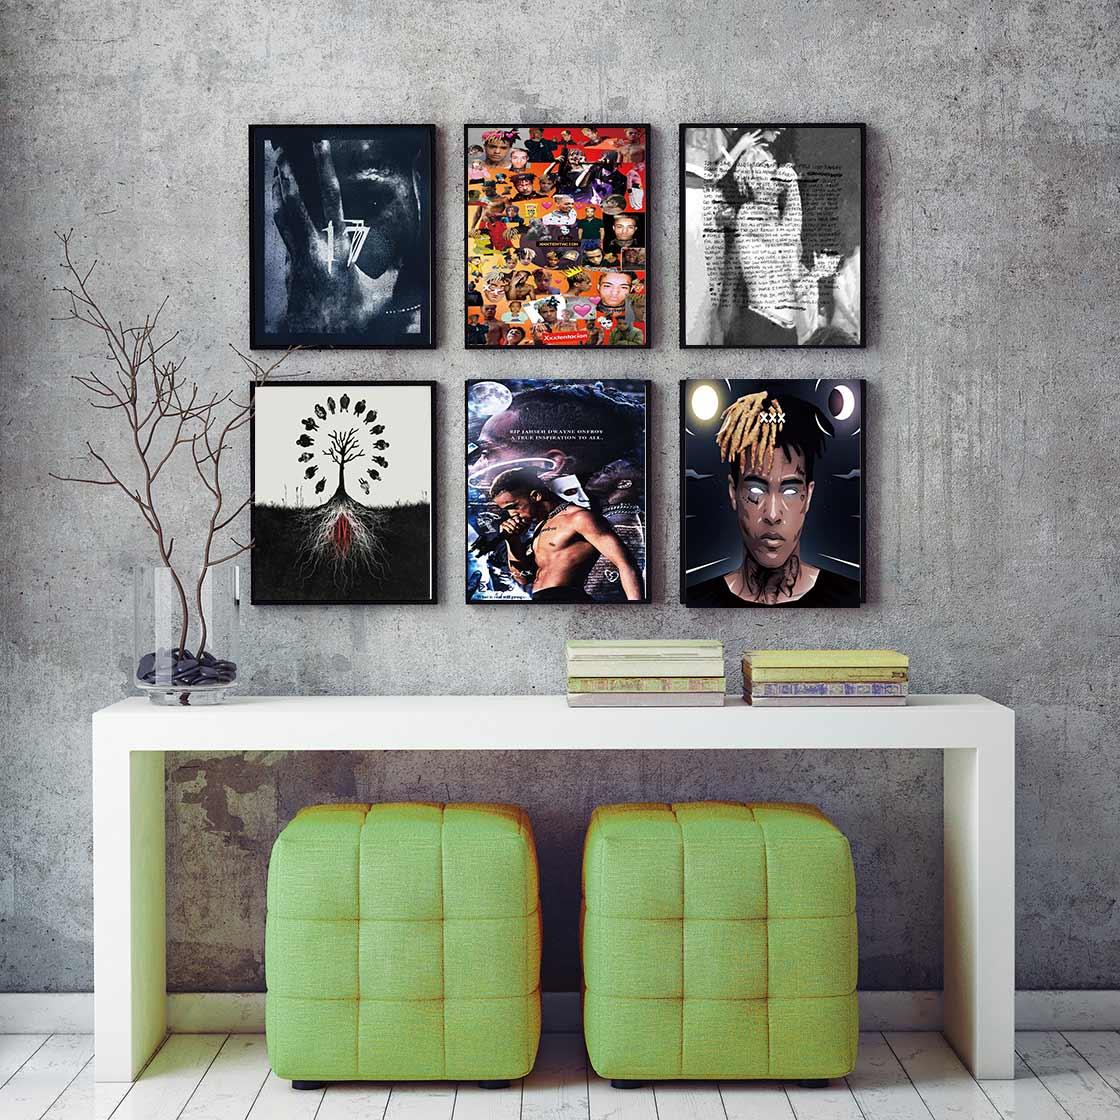 D39 XXXTentacion rapero estrella de hip hop Music Singer arte póster de seda lienzo decoración imprimir cuadros de pared 24x36 27x40